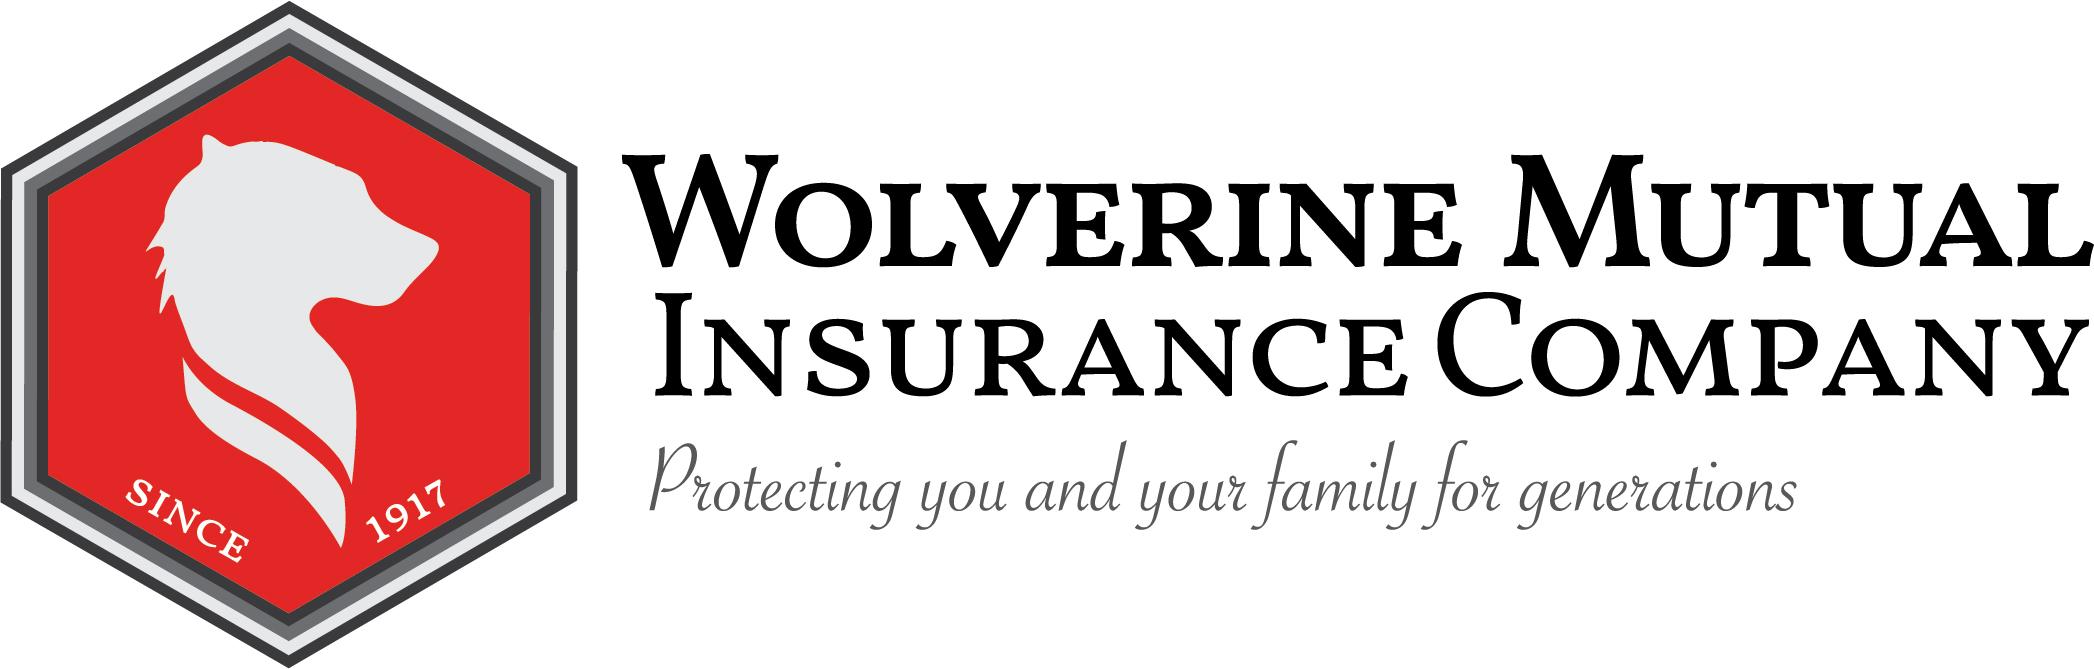 Wolverine Mutual Insurance Company Logo